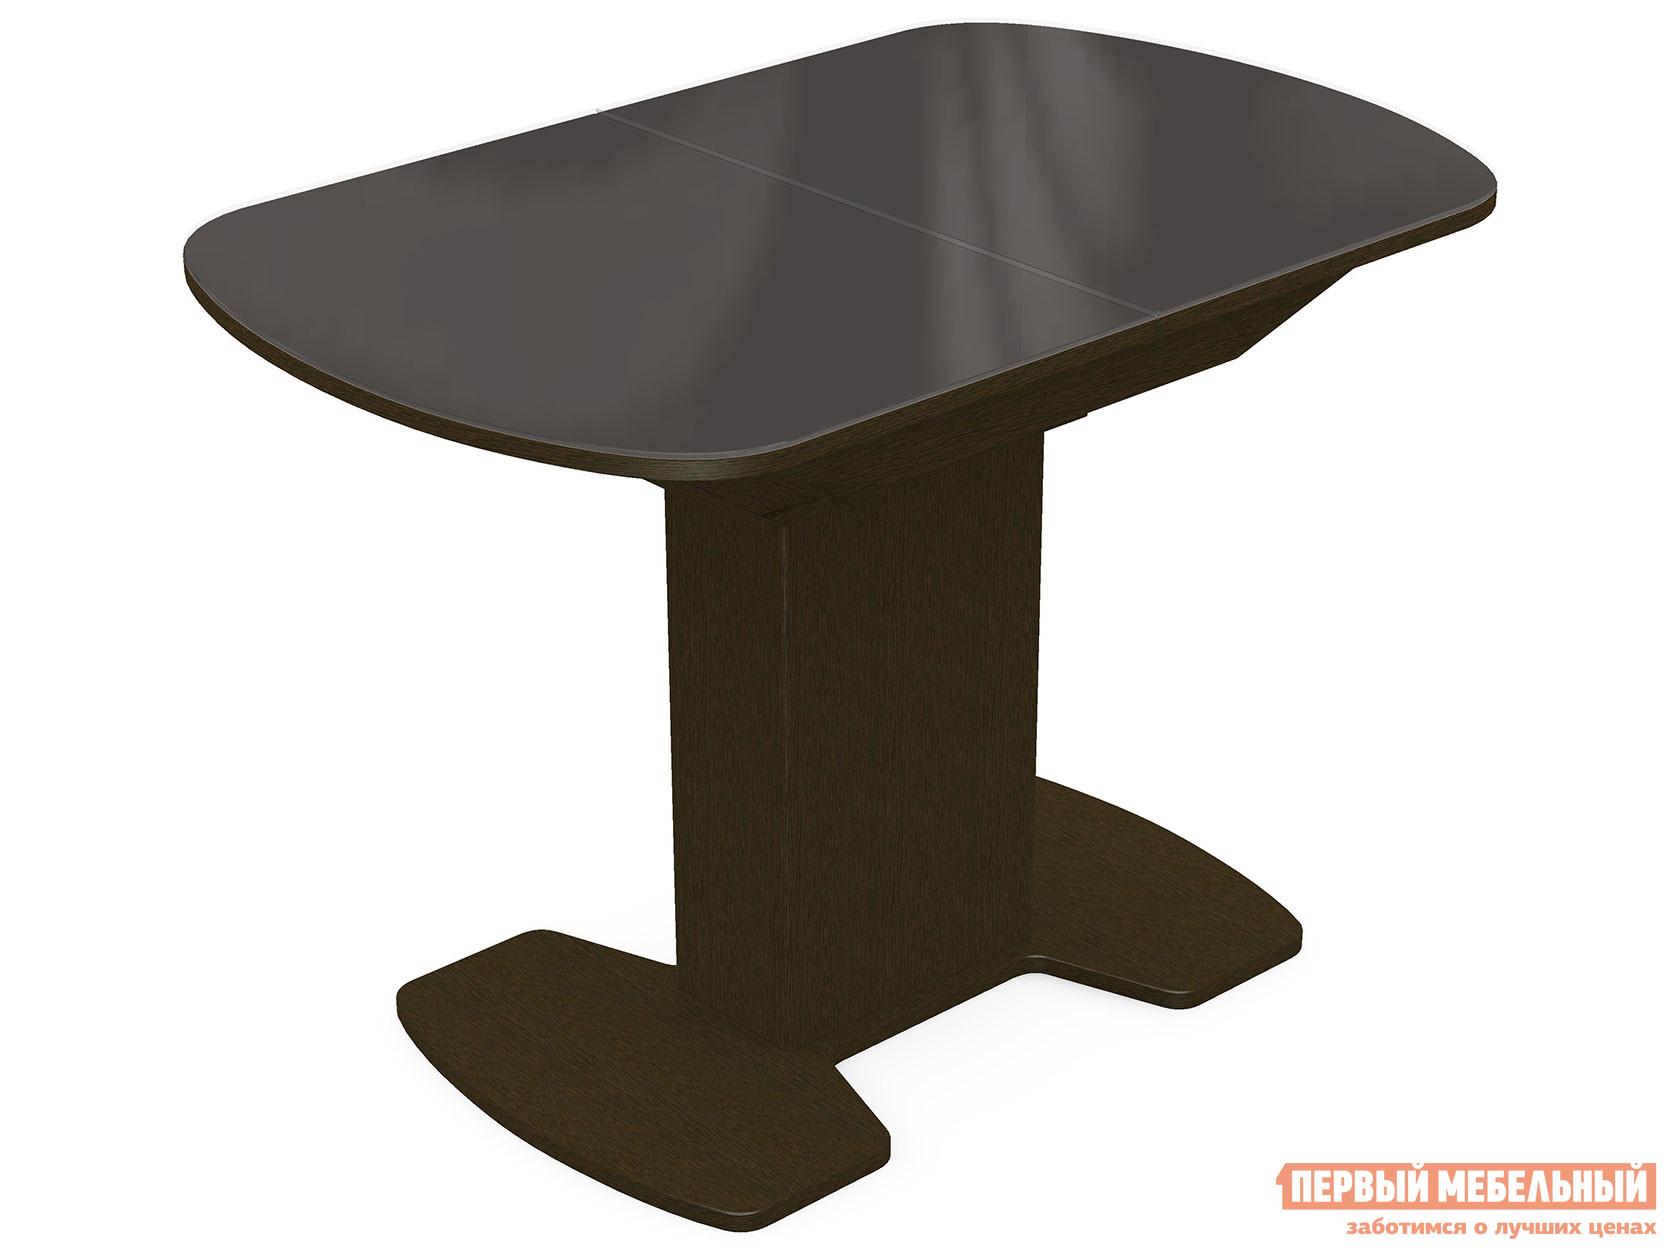 Кухонный стол Линоторг Корсика - Стекло